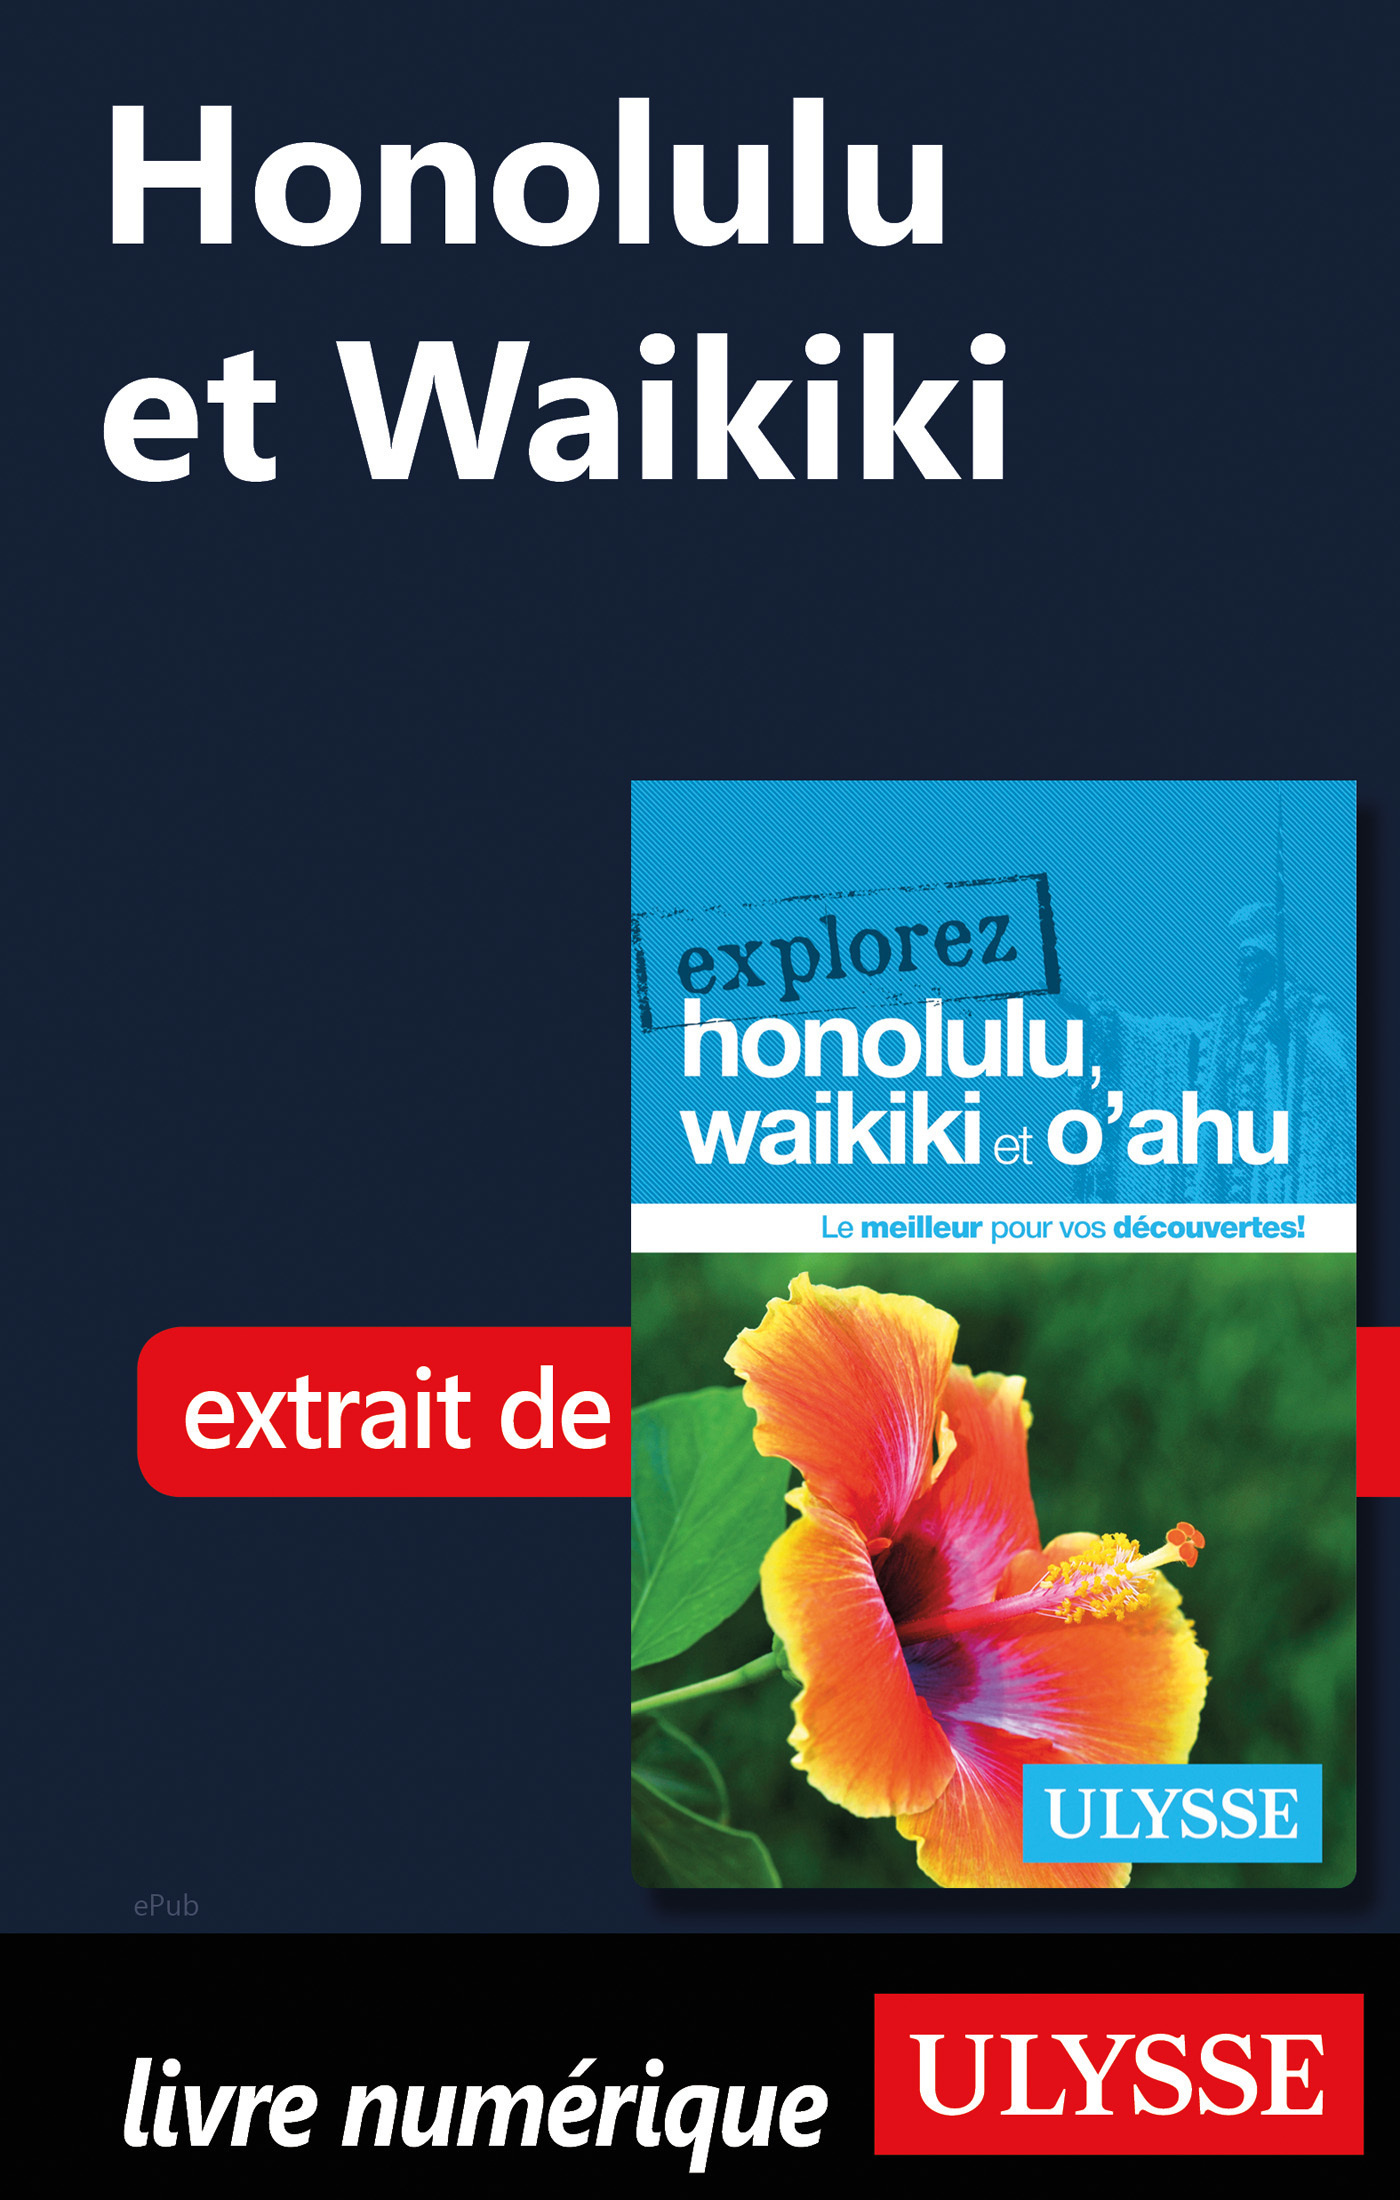 Honolulu et Waikiki